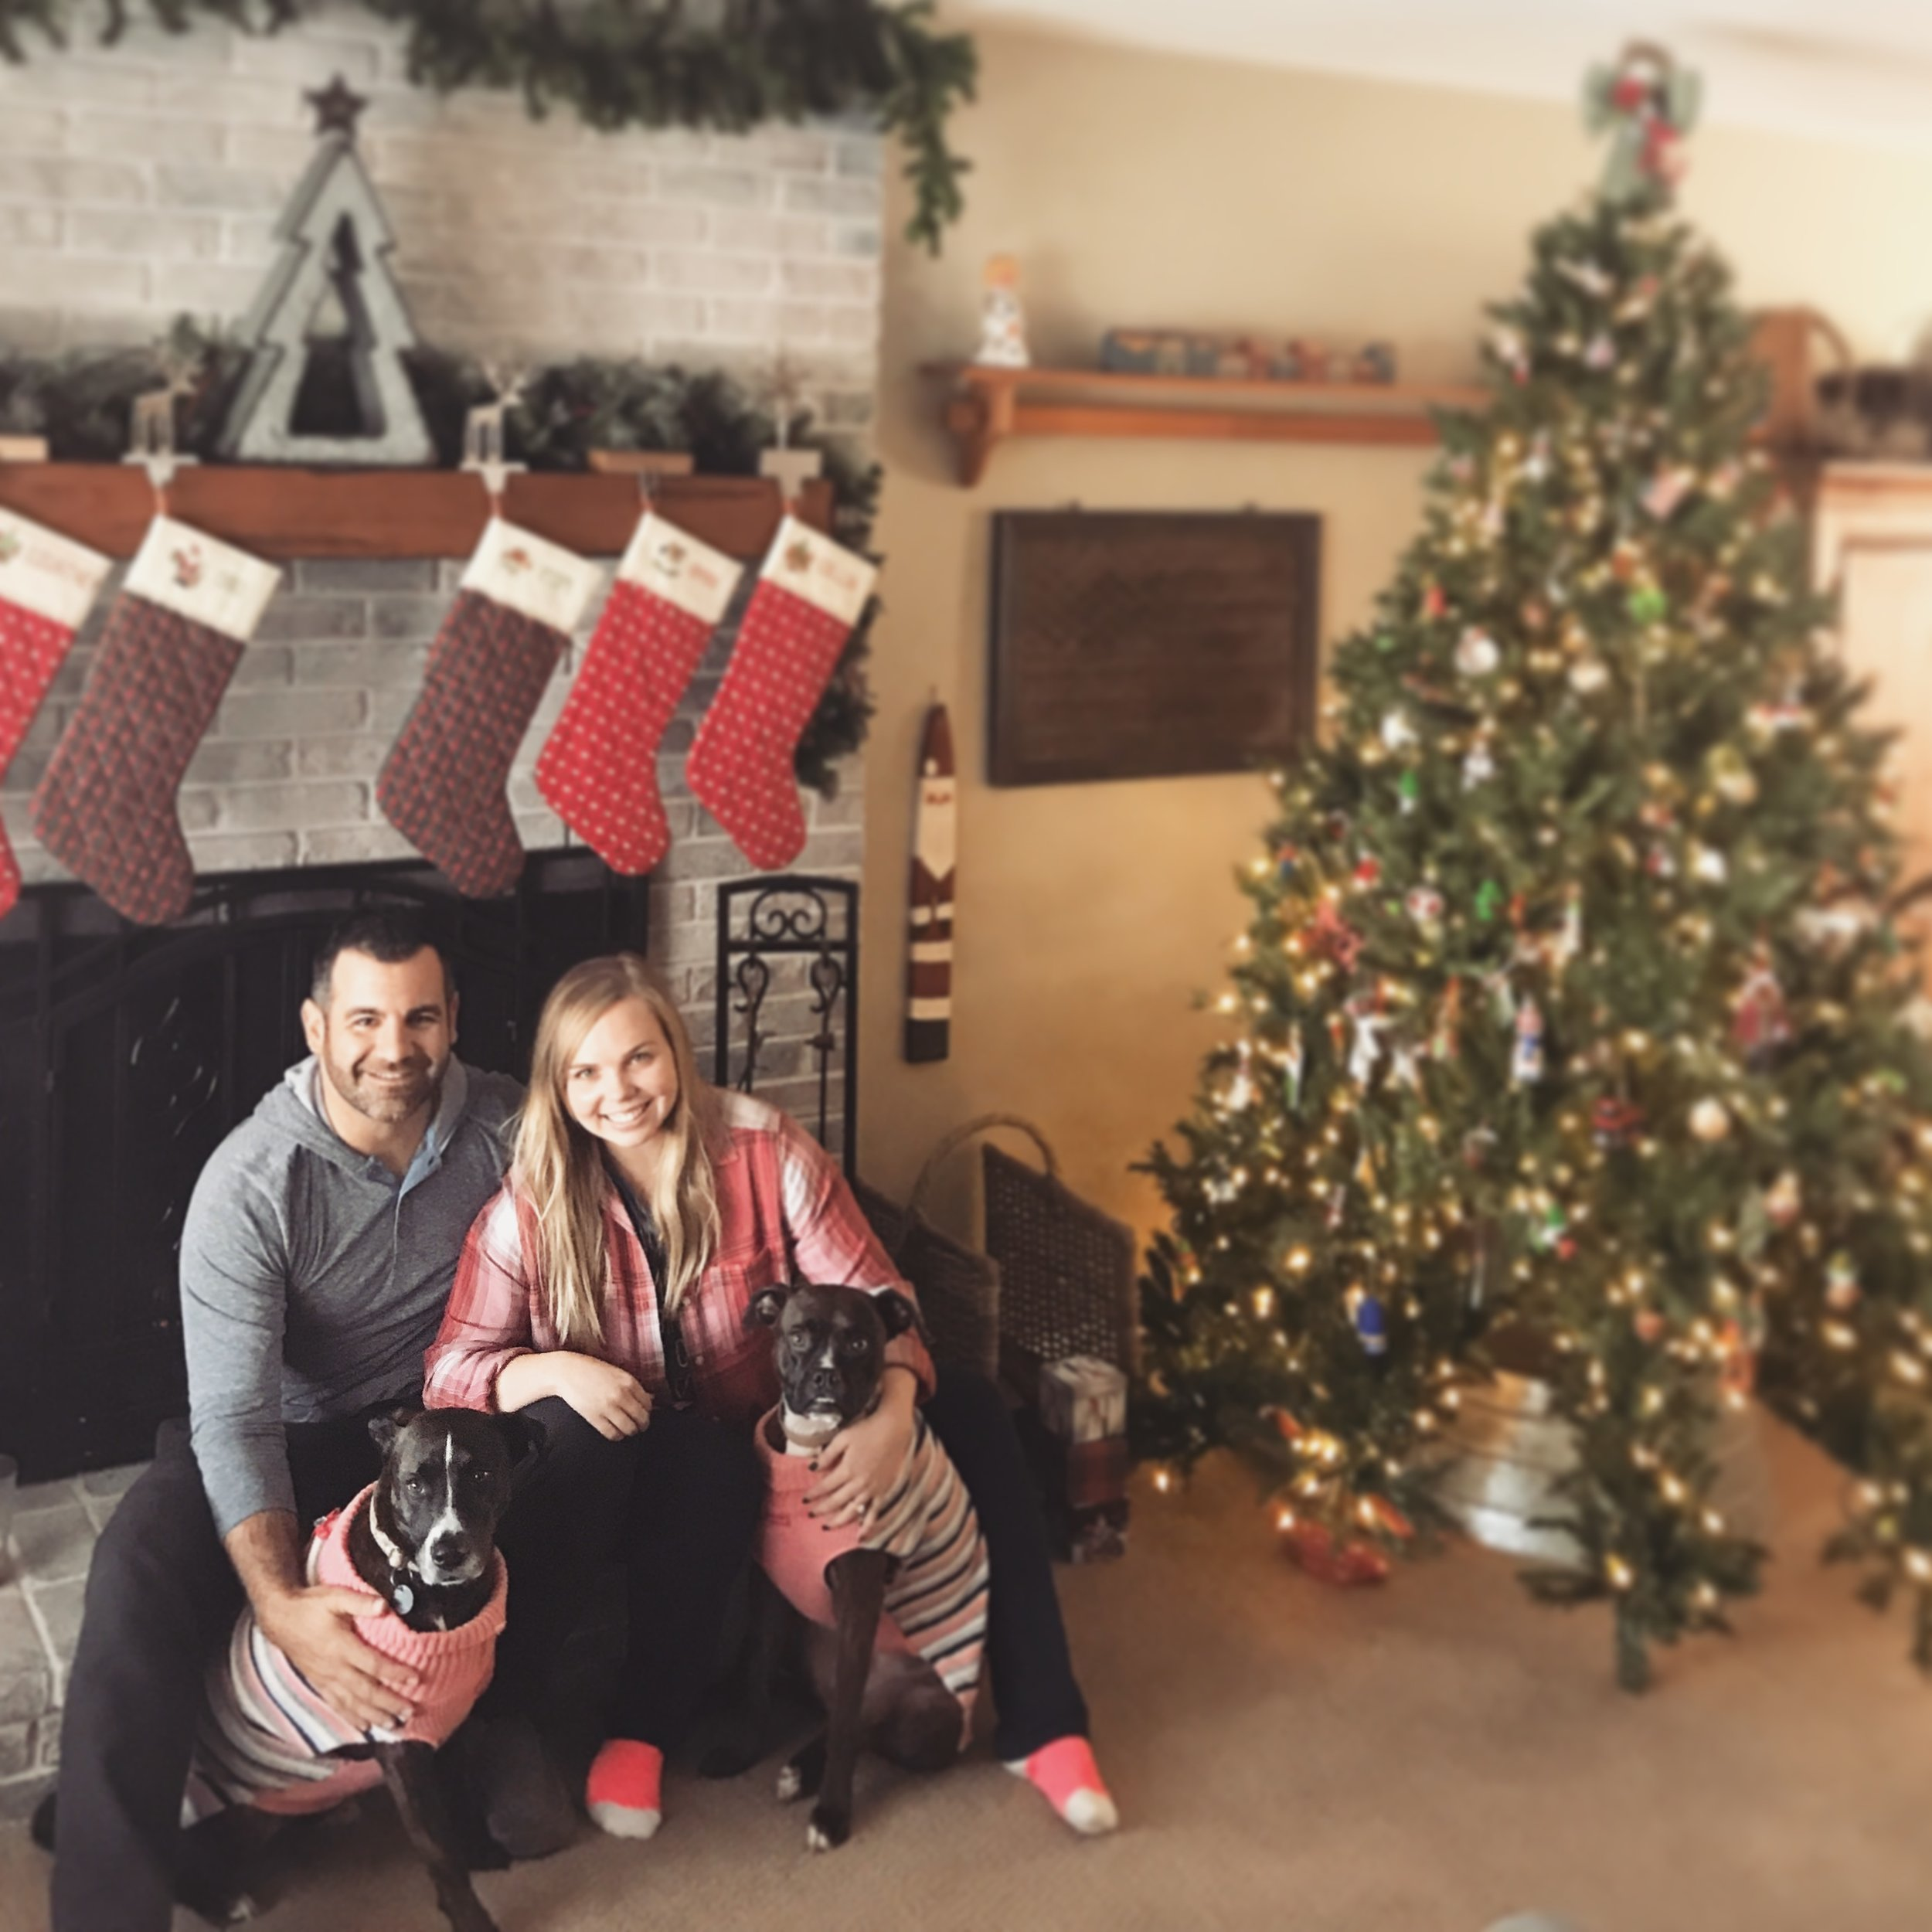 Christmas in Saint Louis